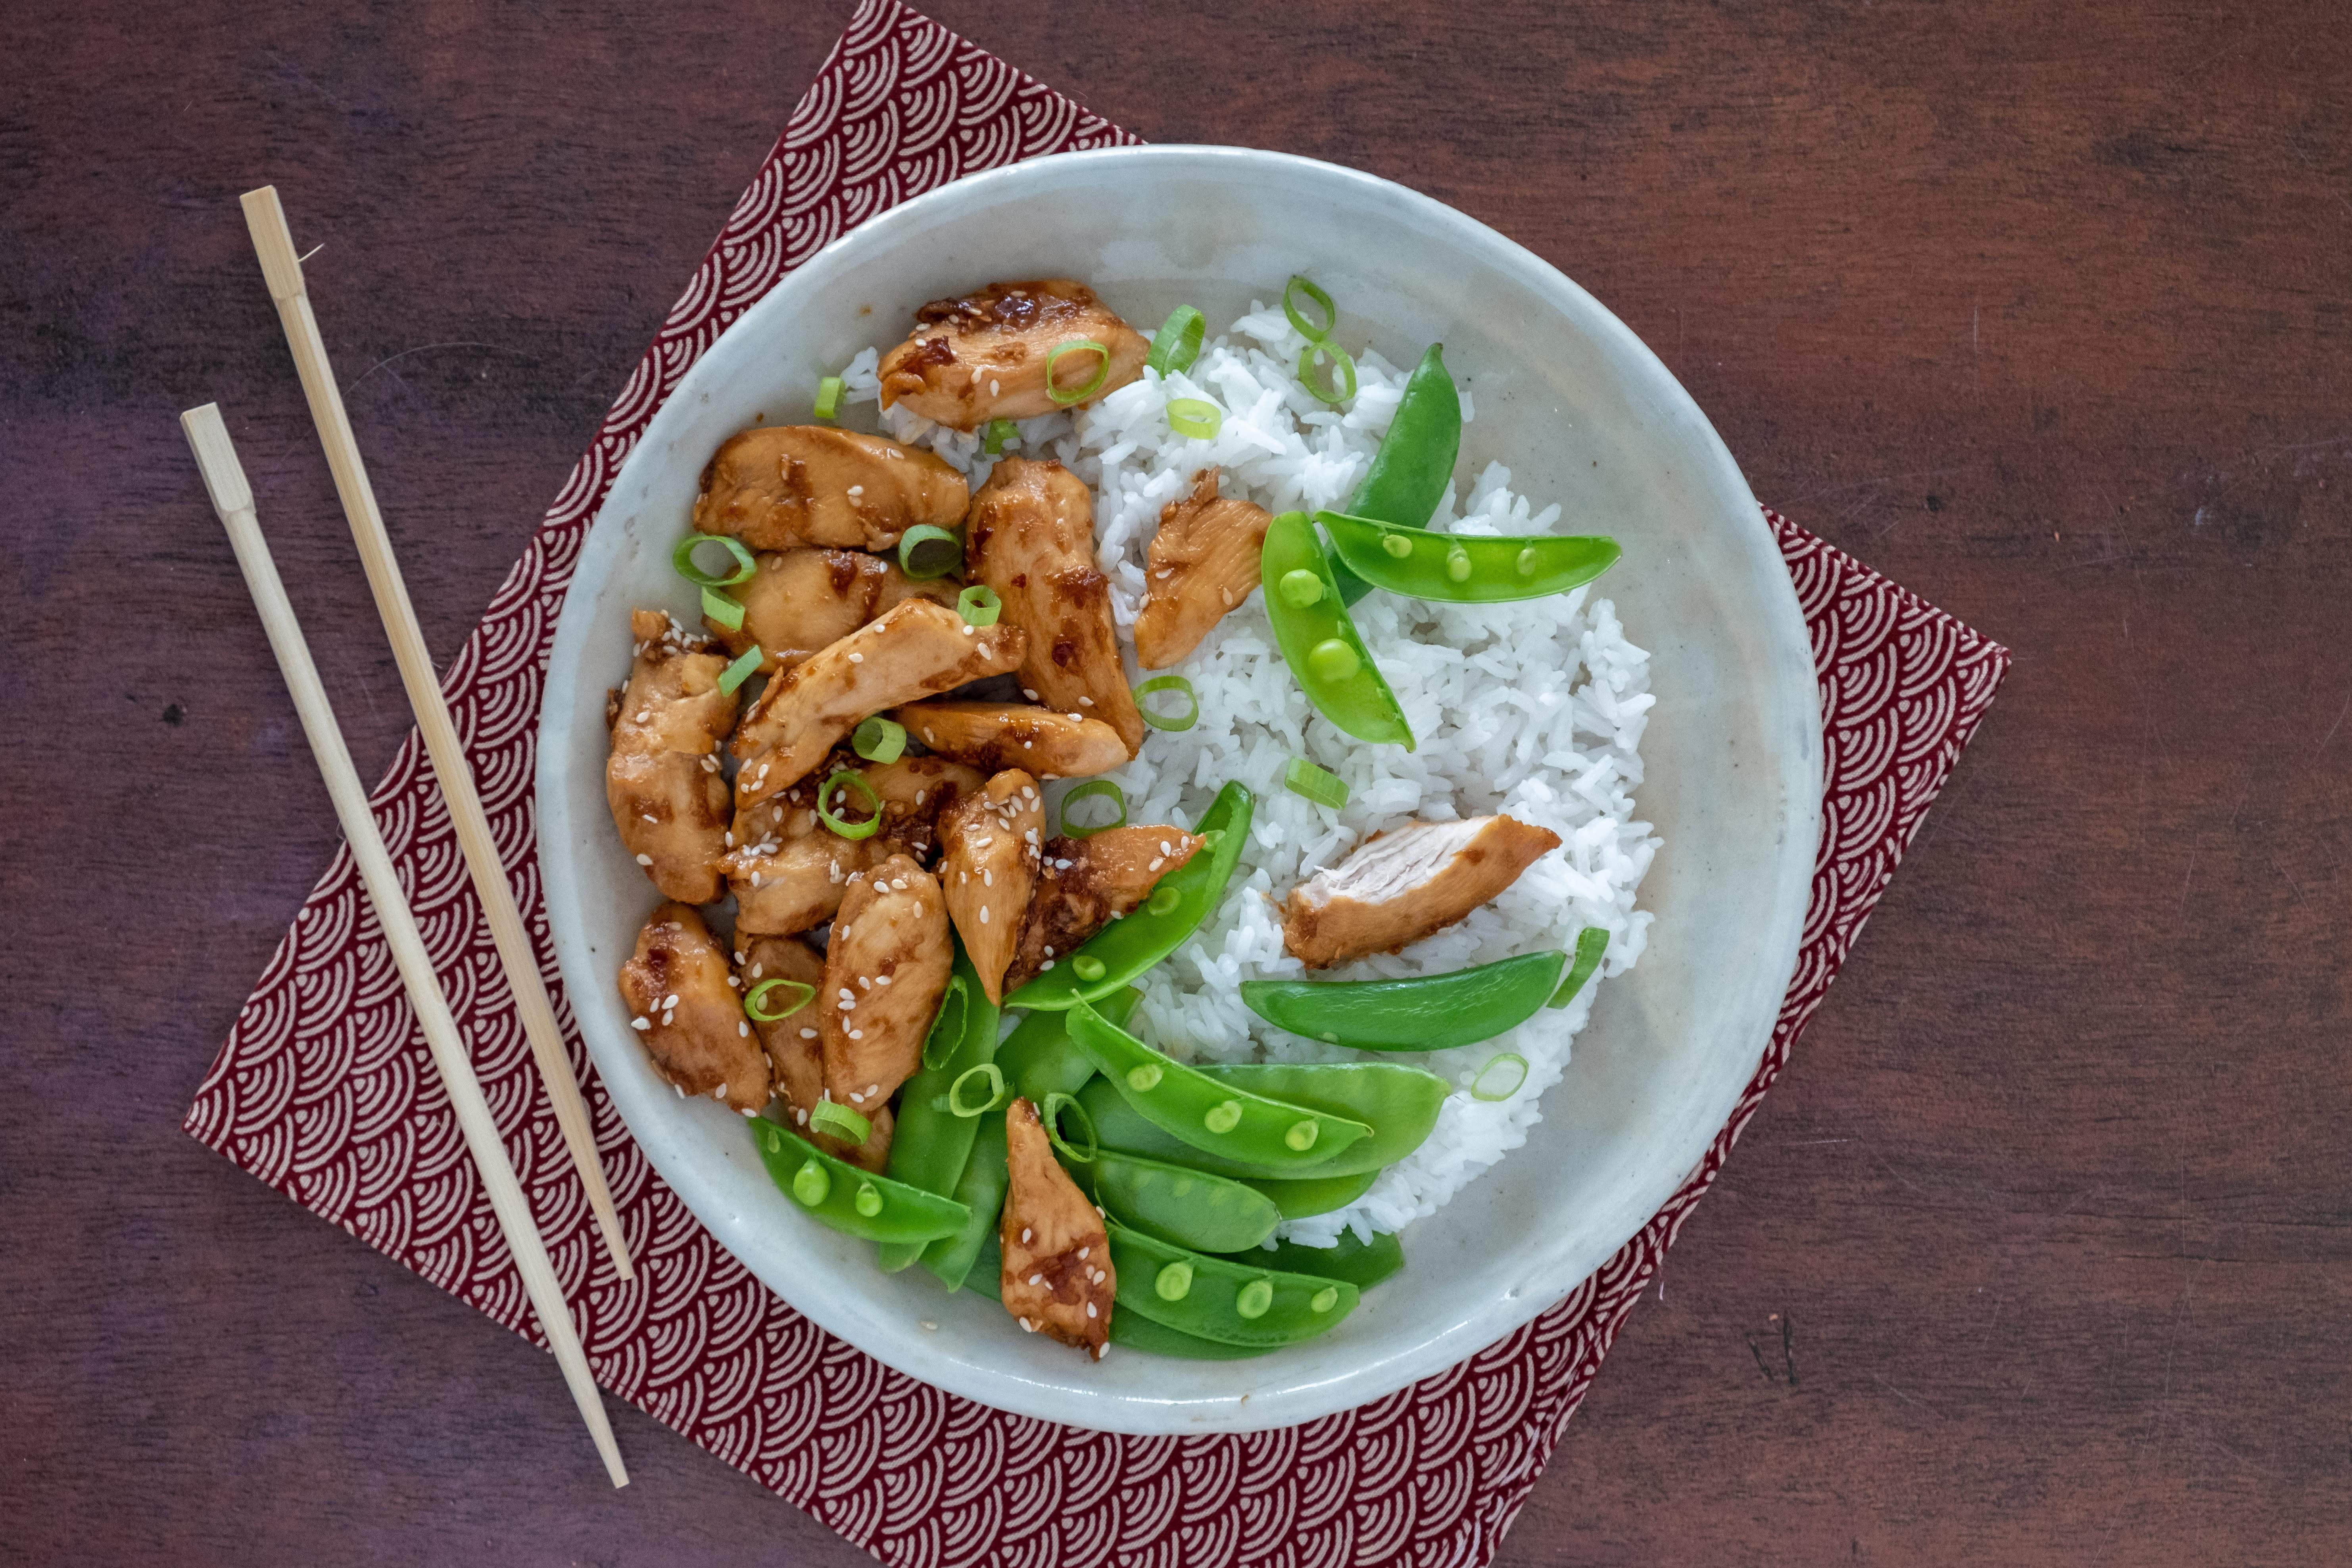 Teriyaki Chicken with Jasmine Rice and Greens